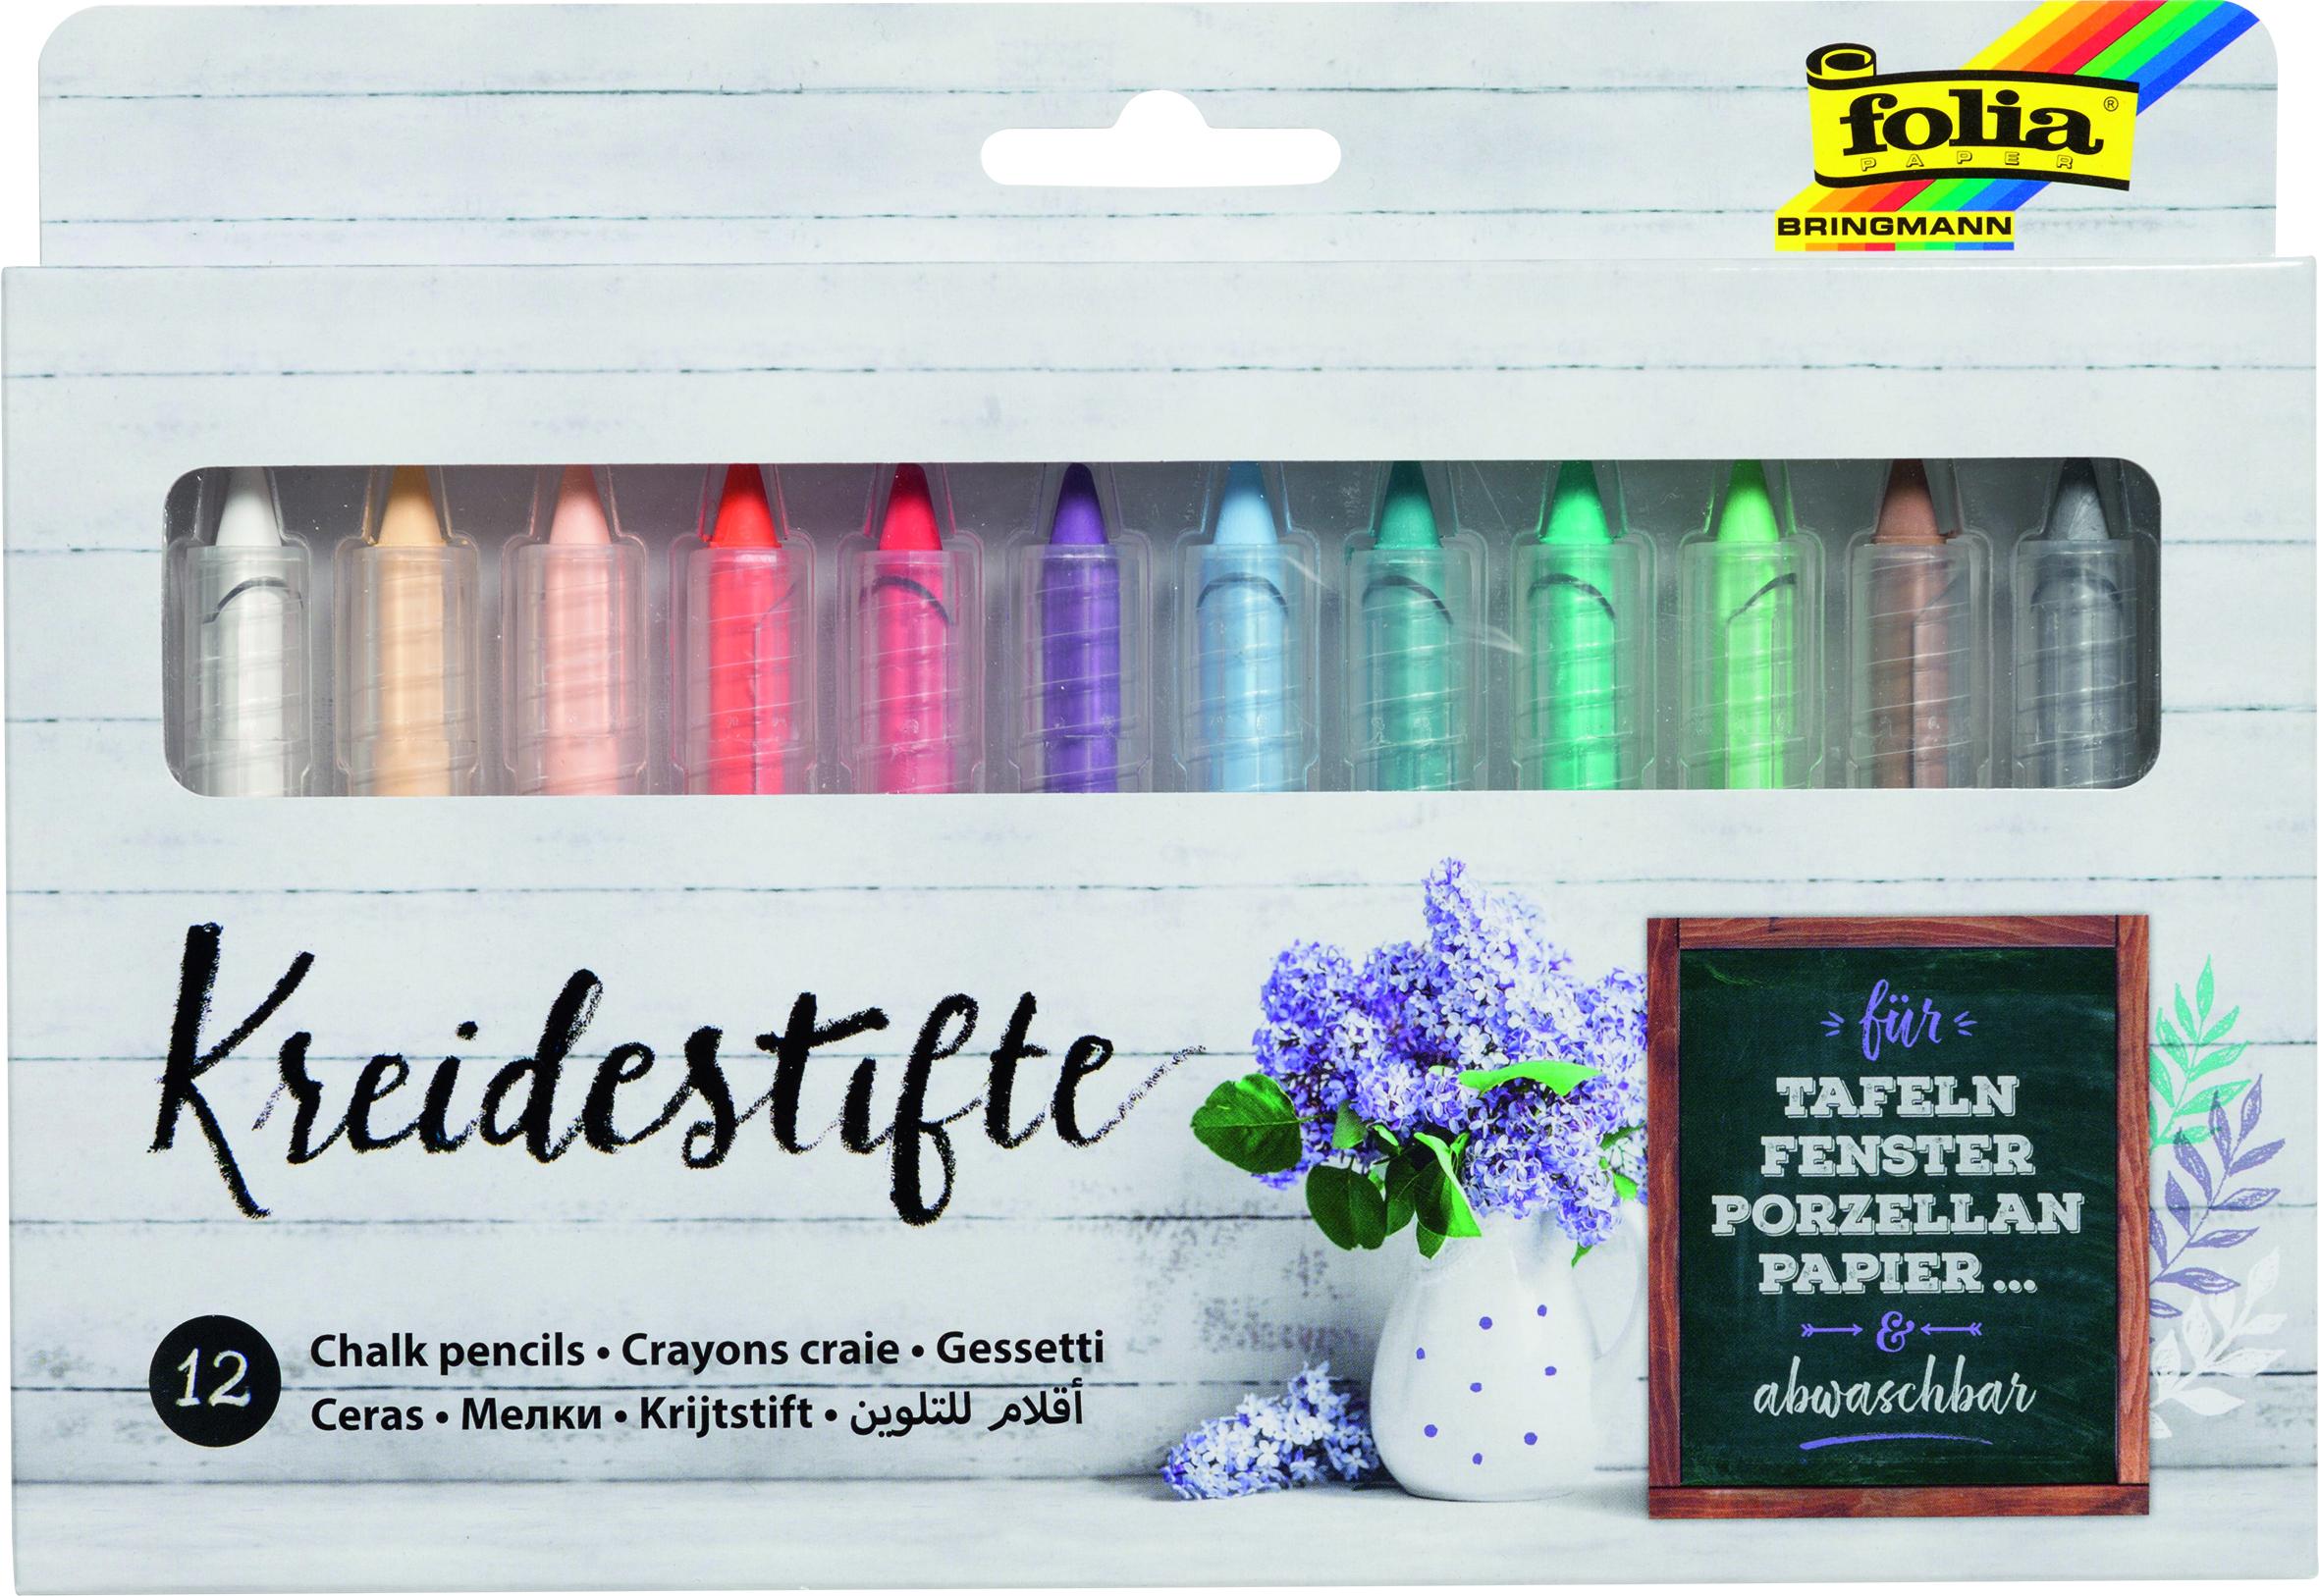 Vorschau: Folia Kreidestifte 12 Farben sortiert